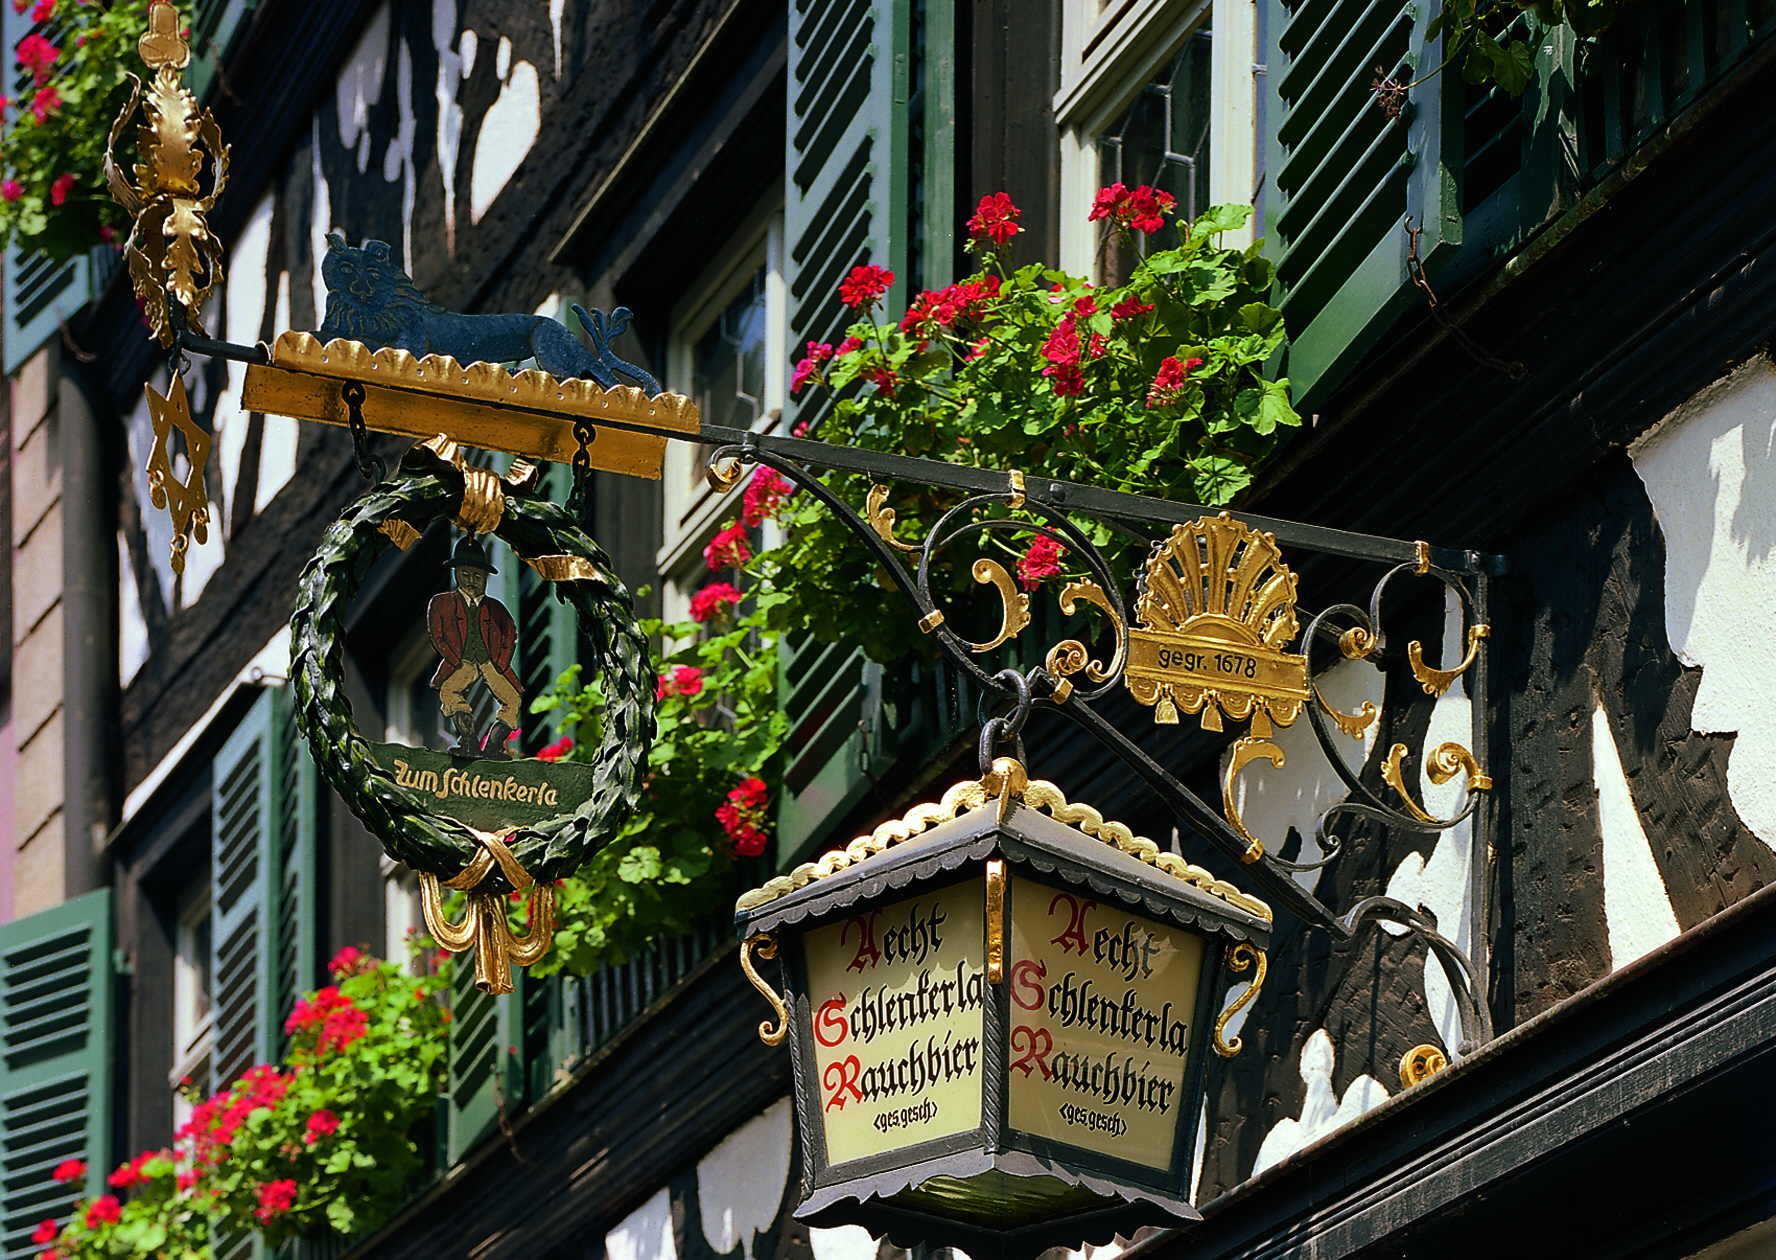 Importation bière brasserie Schlenkerla